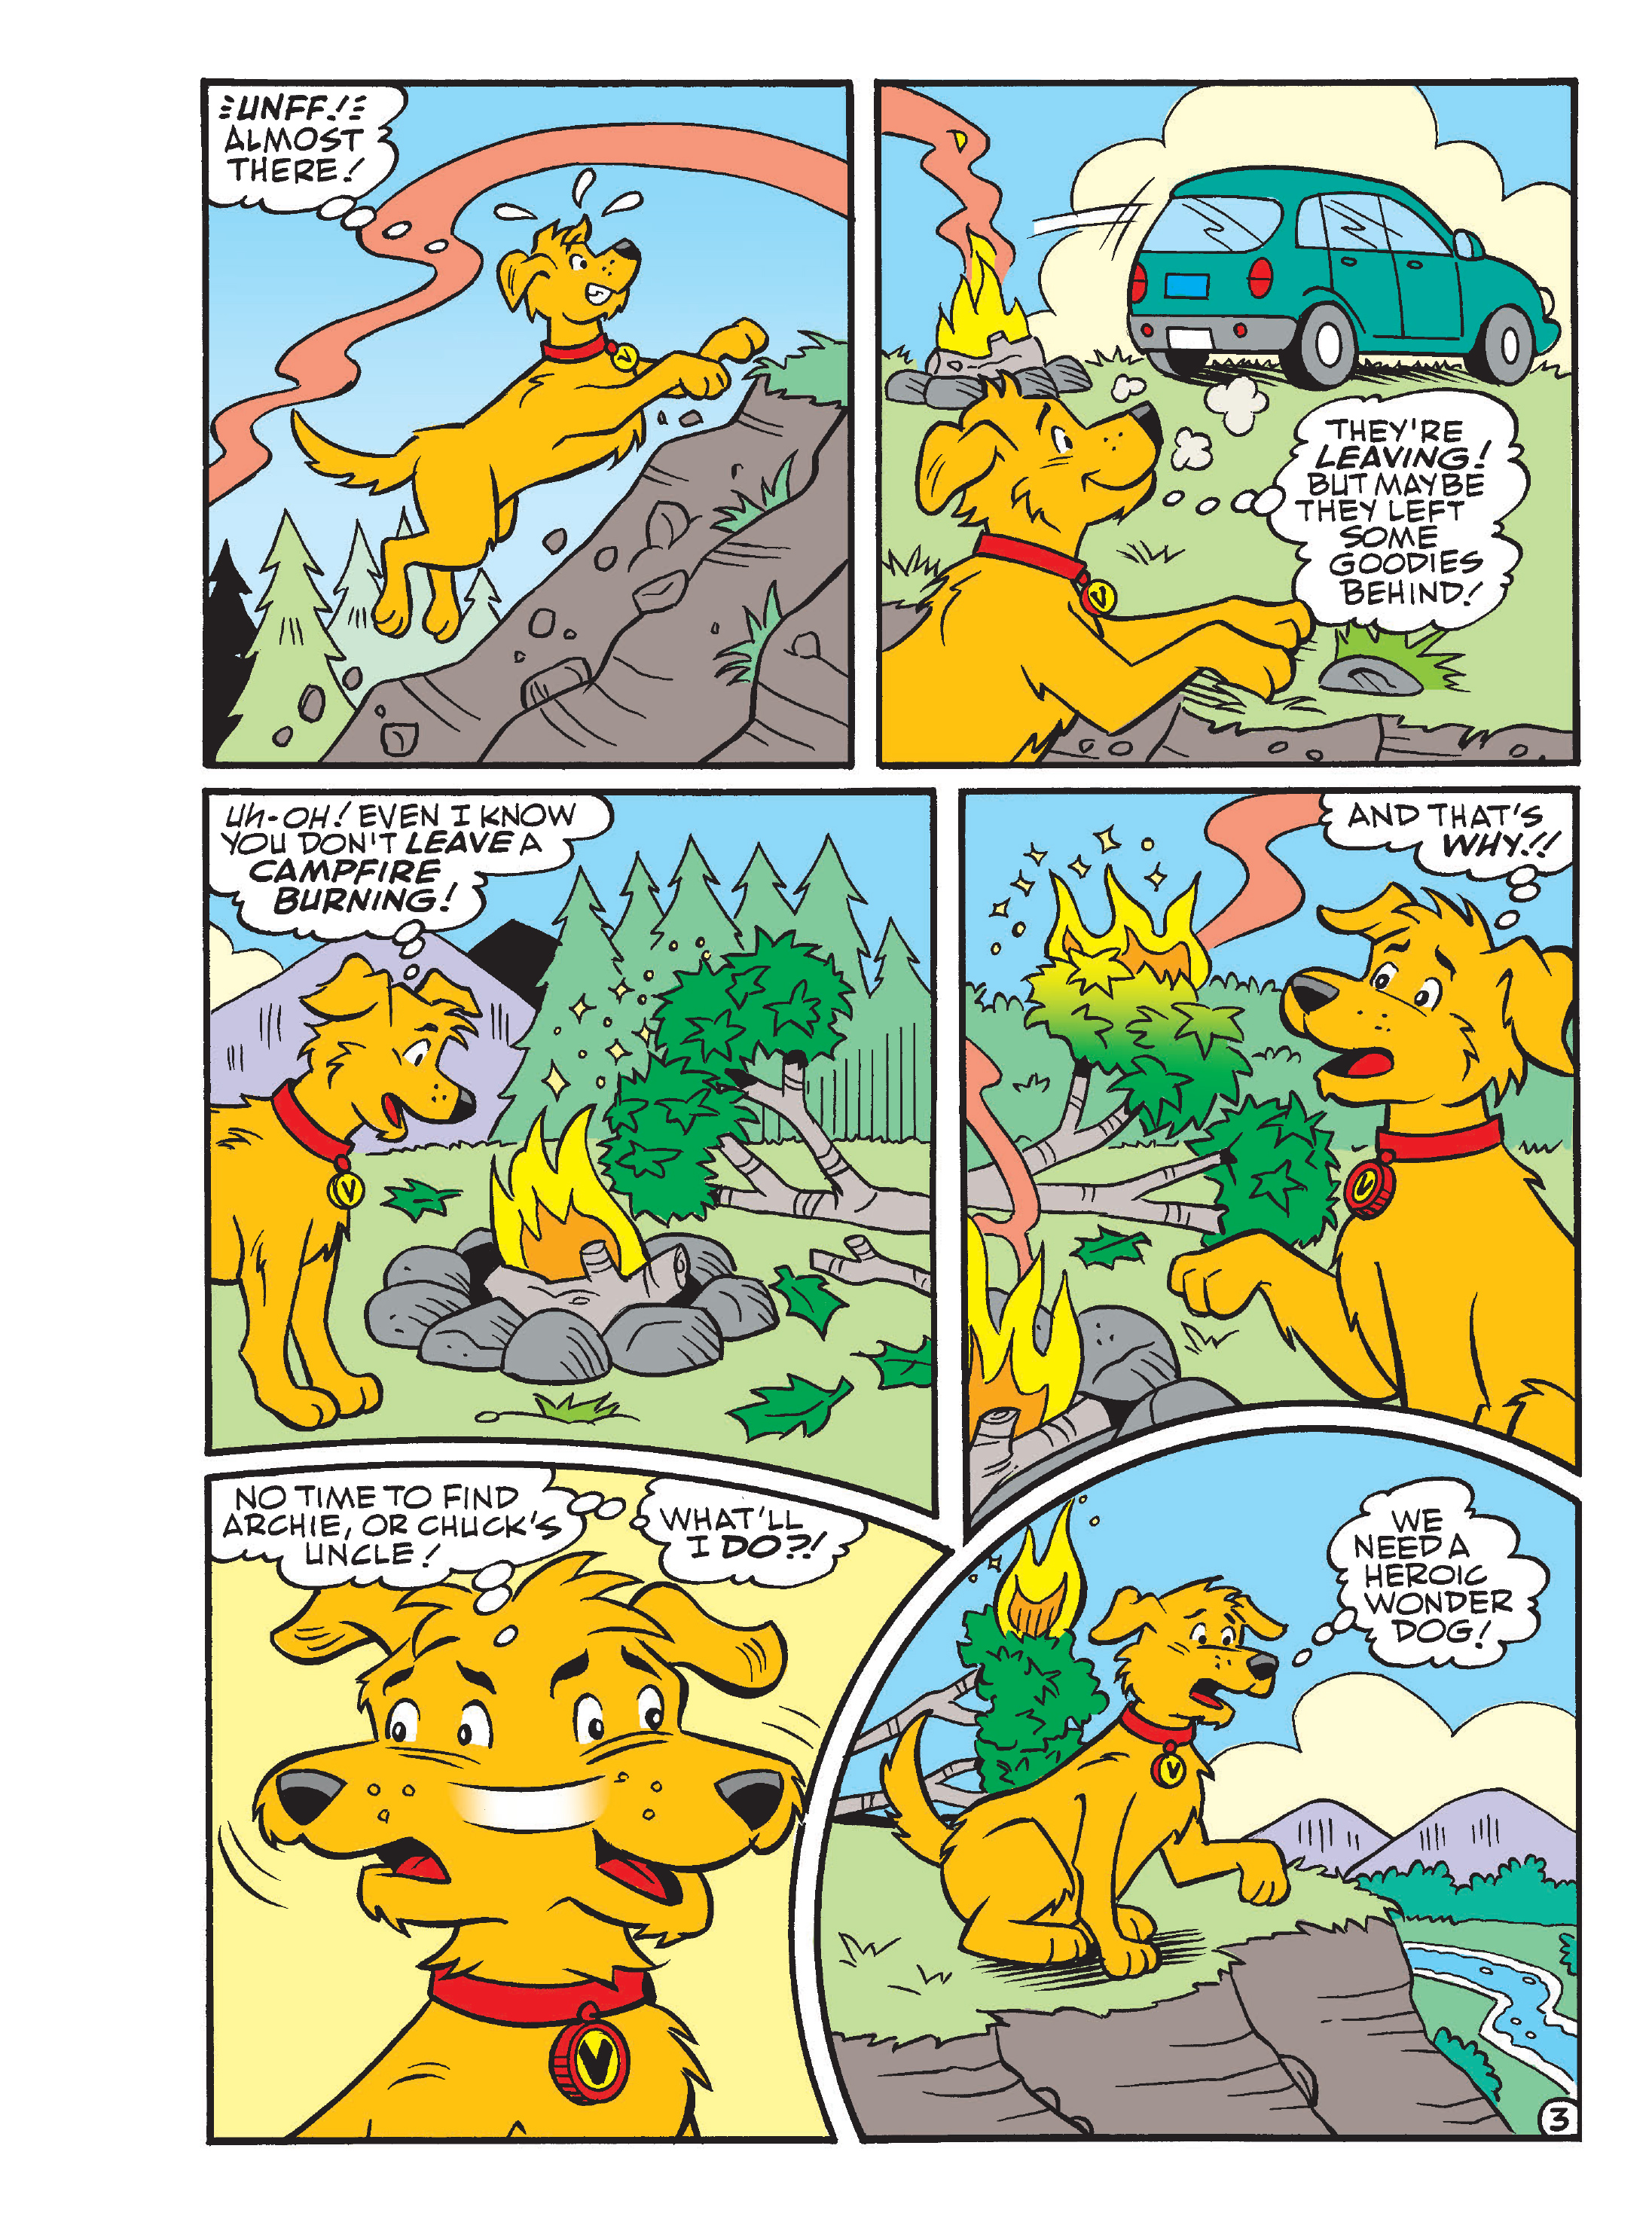 Archie&Friends Digital Digest(2018): Chapter 1 - Page Archie&Friends Digital Digest(2018)